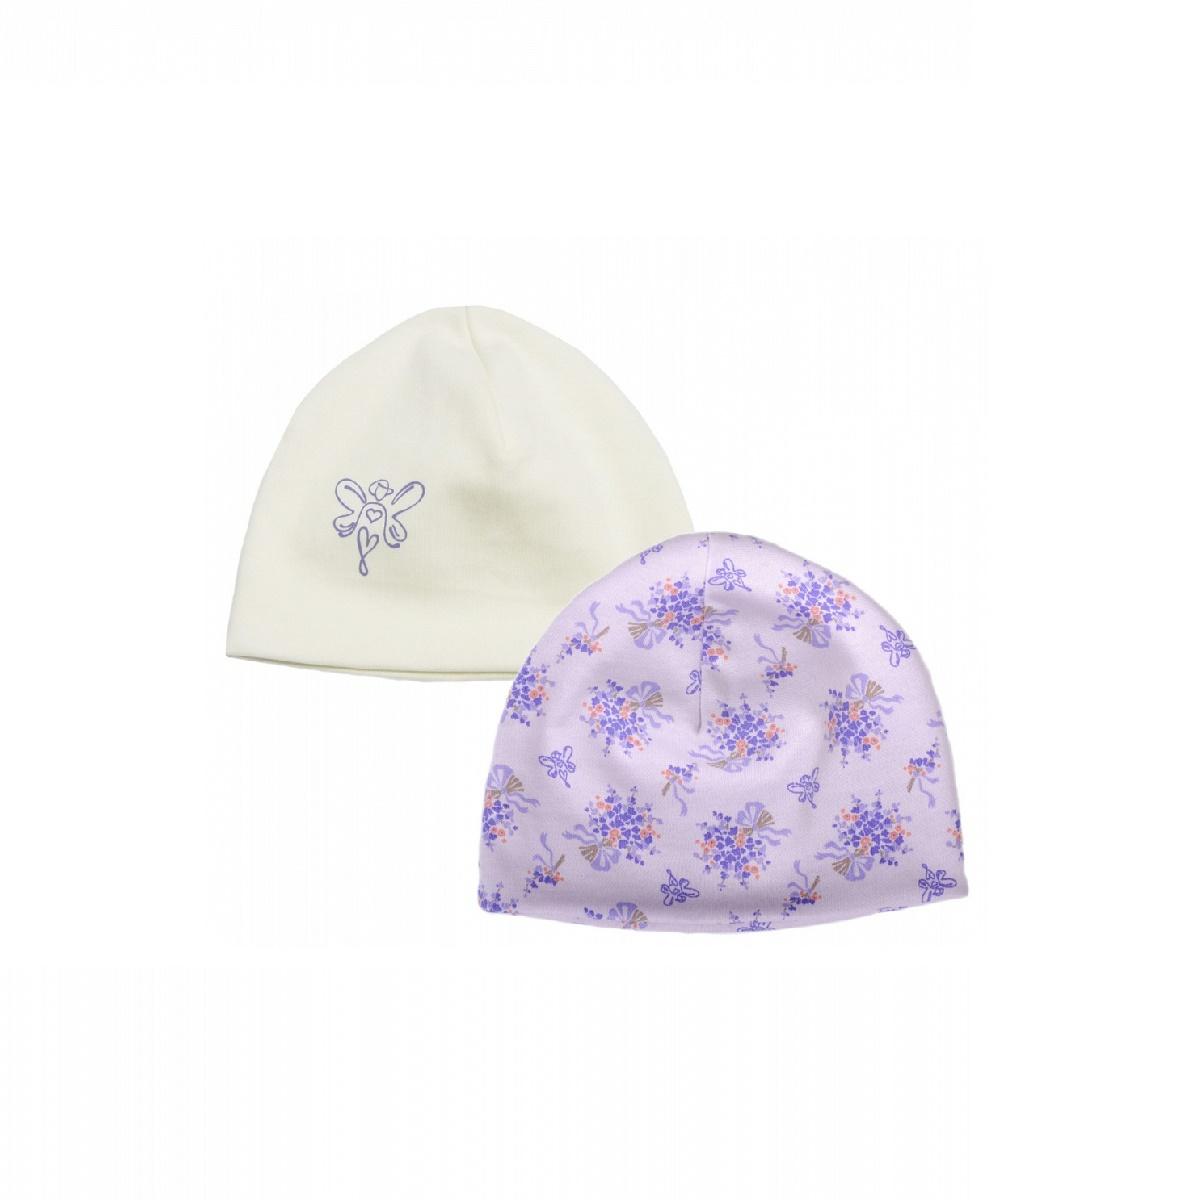 Комплект из 2-х шапок Мамуляндия Лаванда размер 48<br>